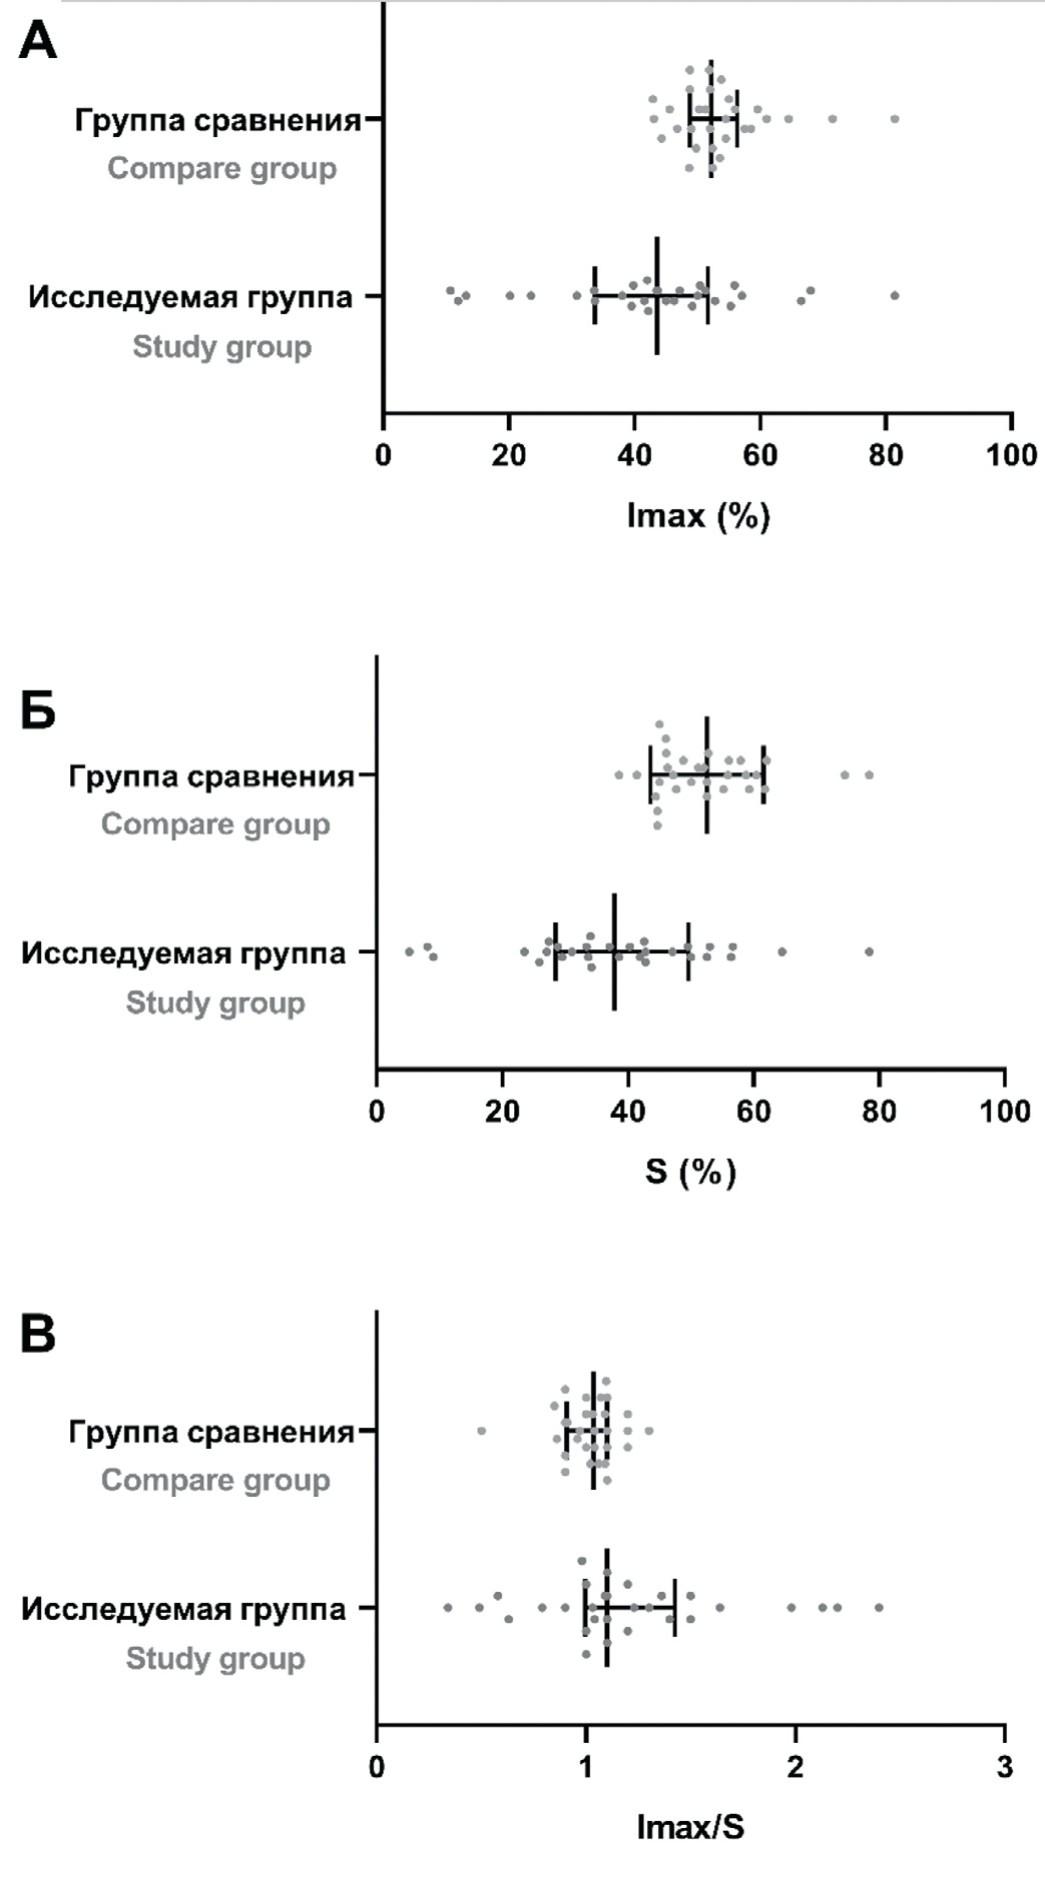 Статистическая характеристика групп в зависимости от параметров: А. Imax (%); Б. S (%); В. Imax/S